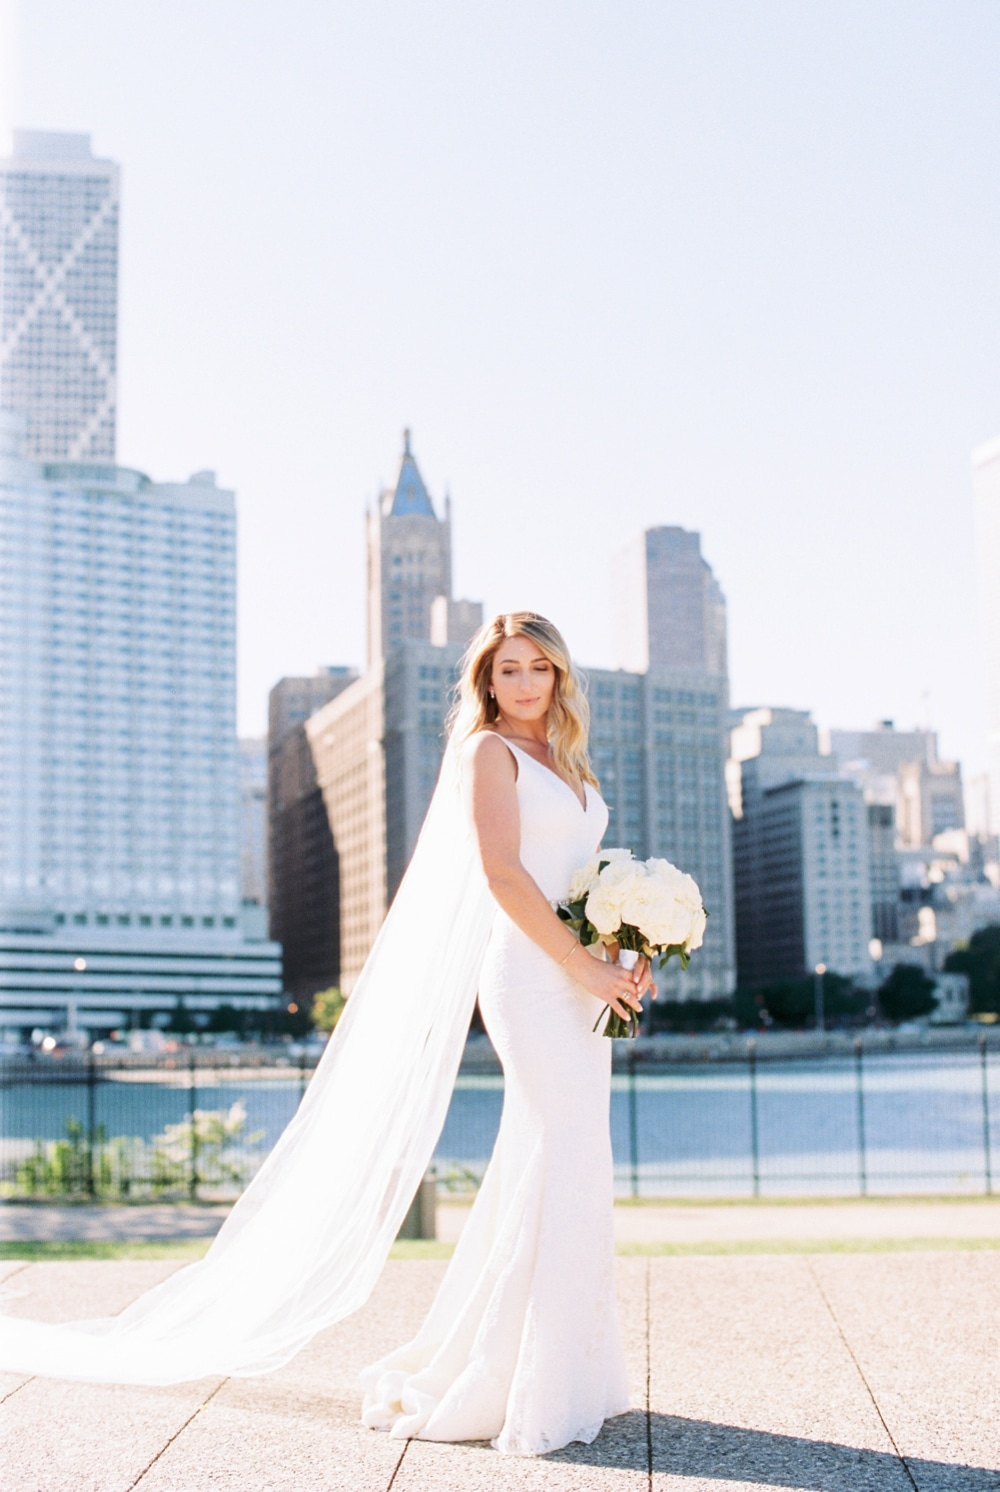 kristin-la-voie-photography-revel-motor-row-chicago-wedding-photographer-104